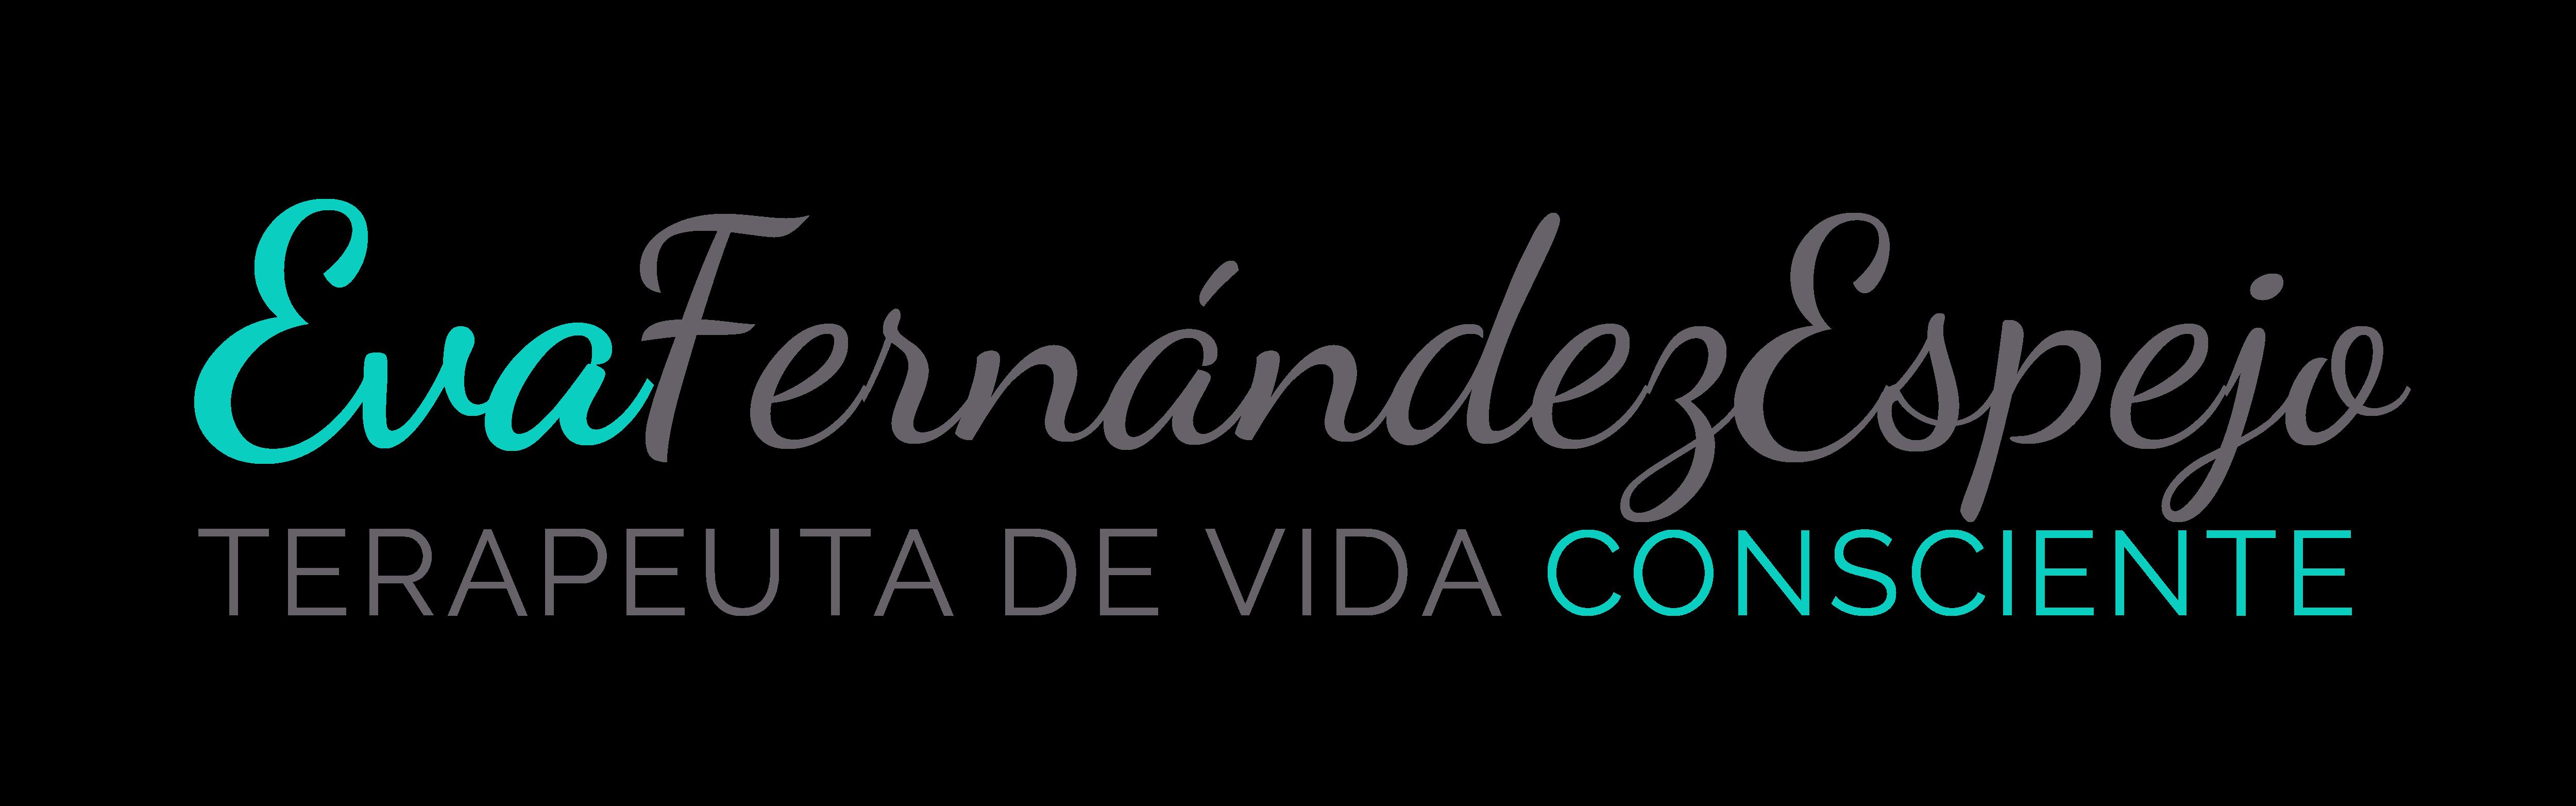 Eva Fernández Espejo